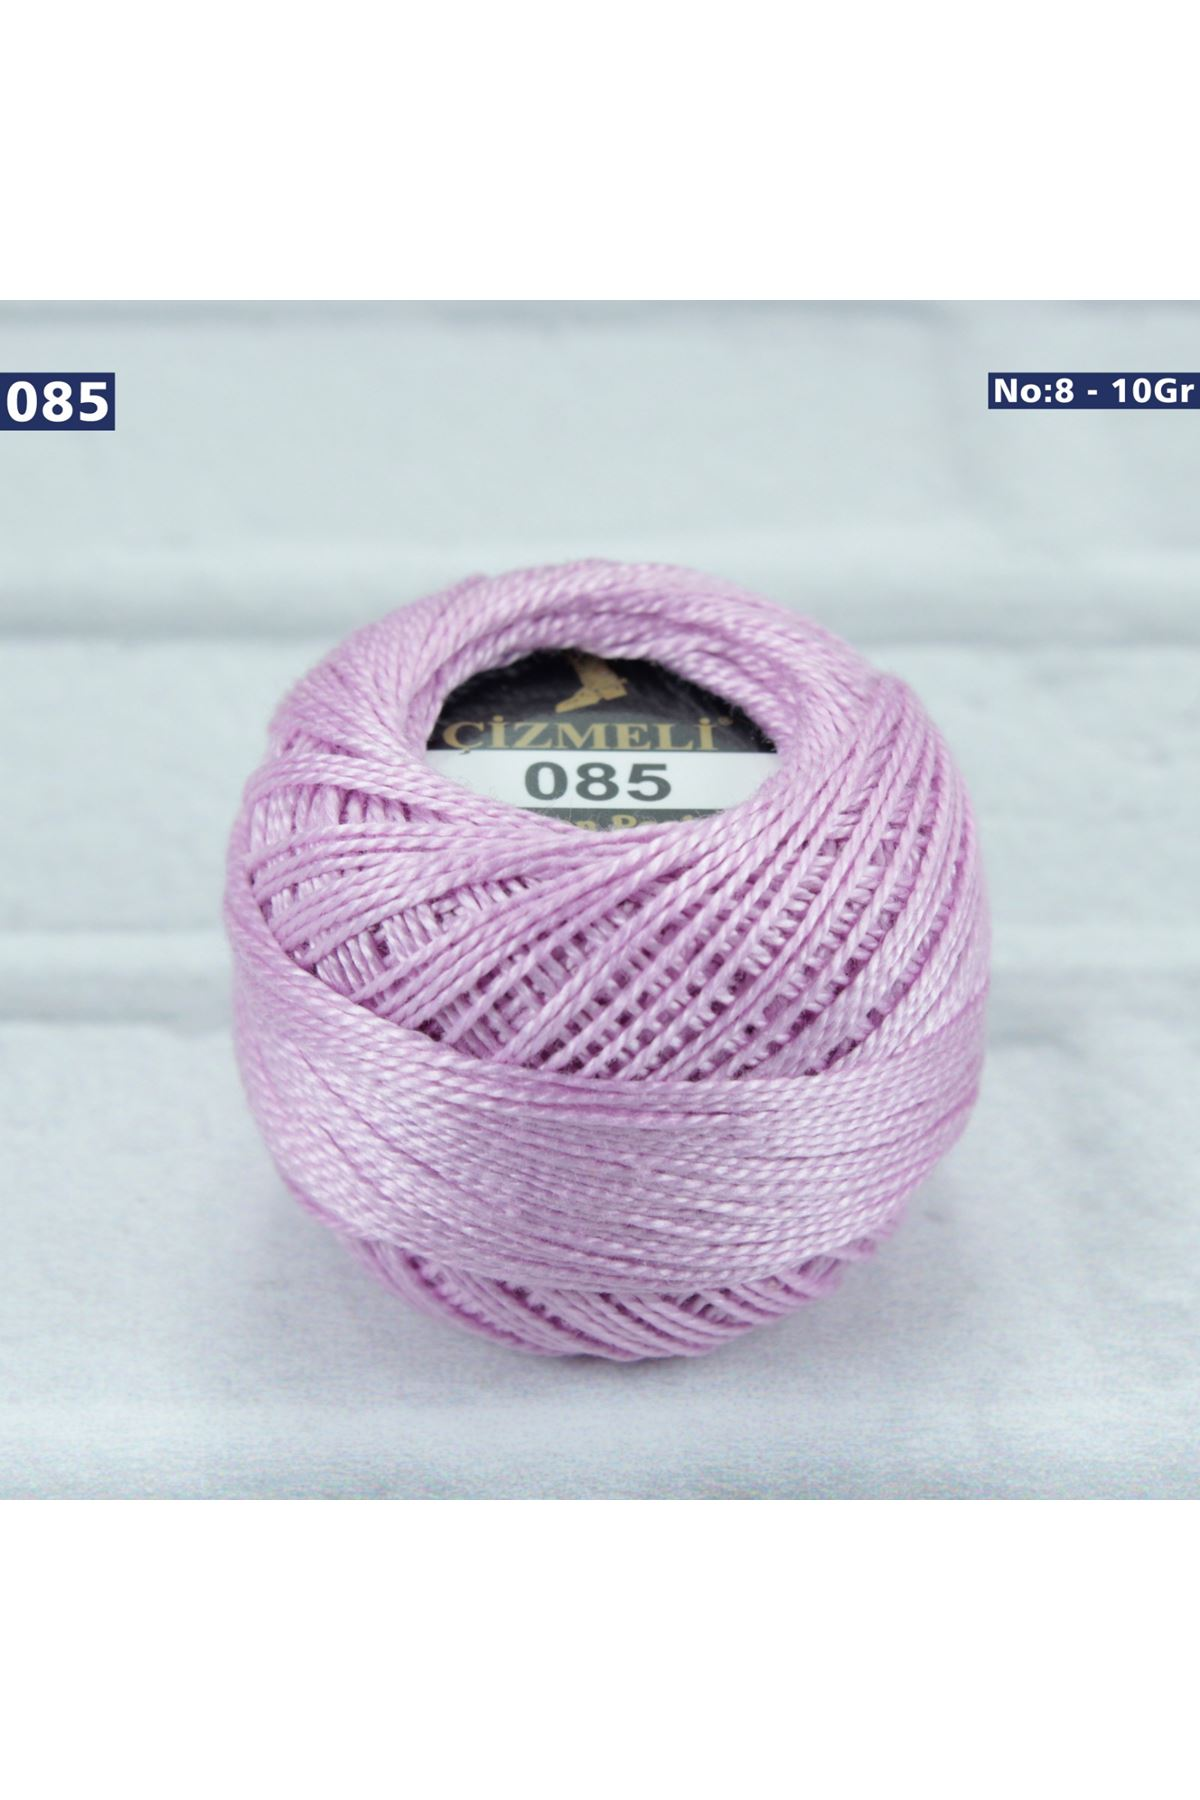 Çizmeli Cotton Perle Nakış İpliği No: 085